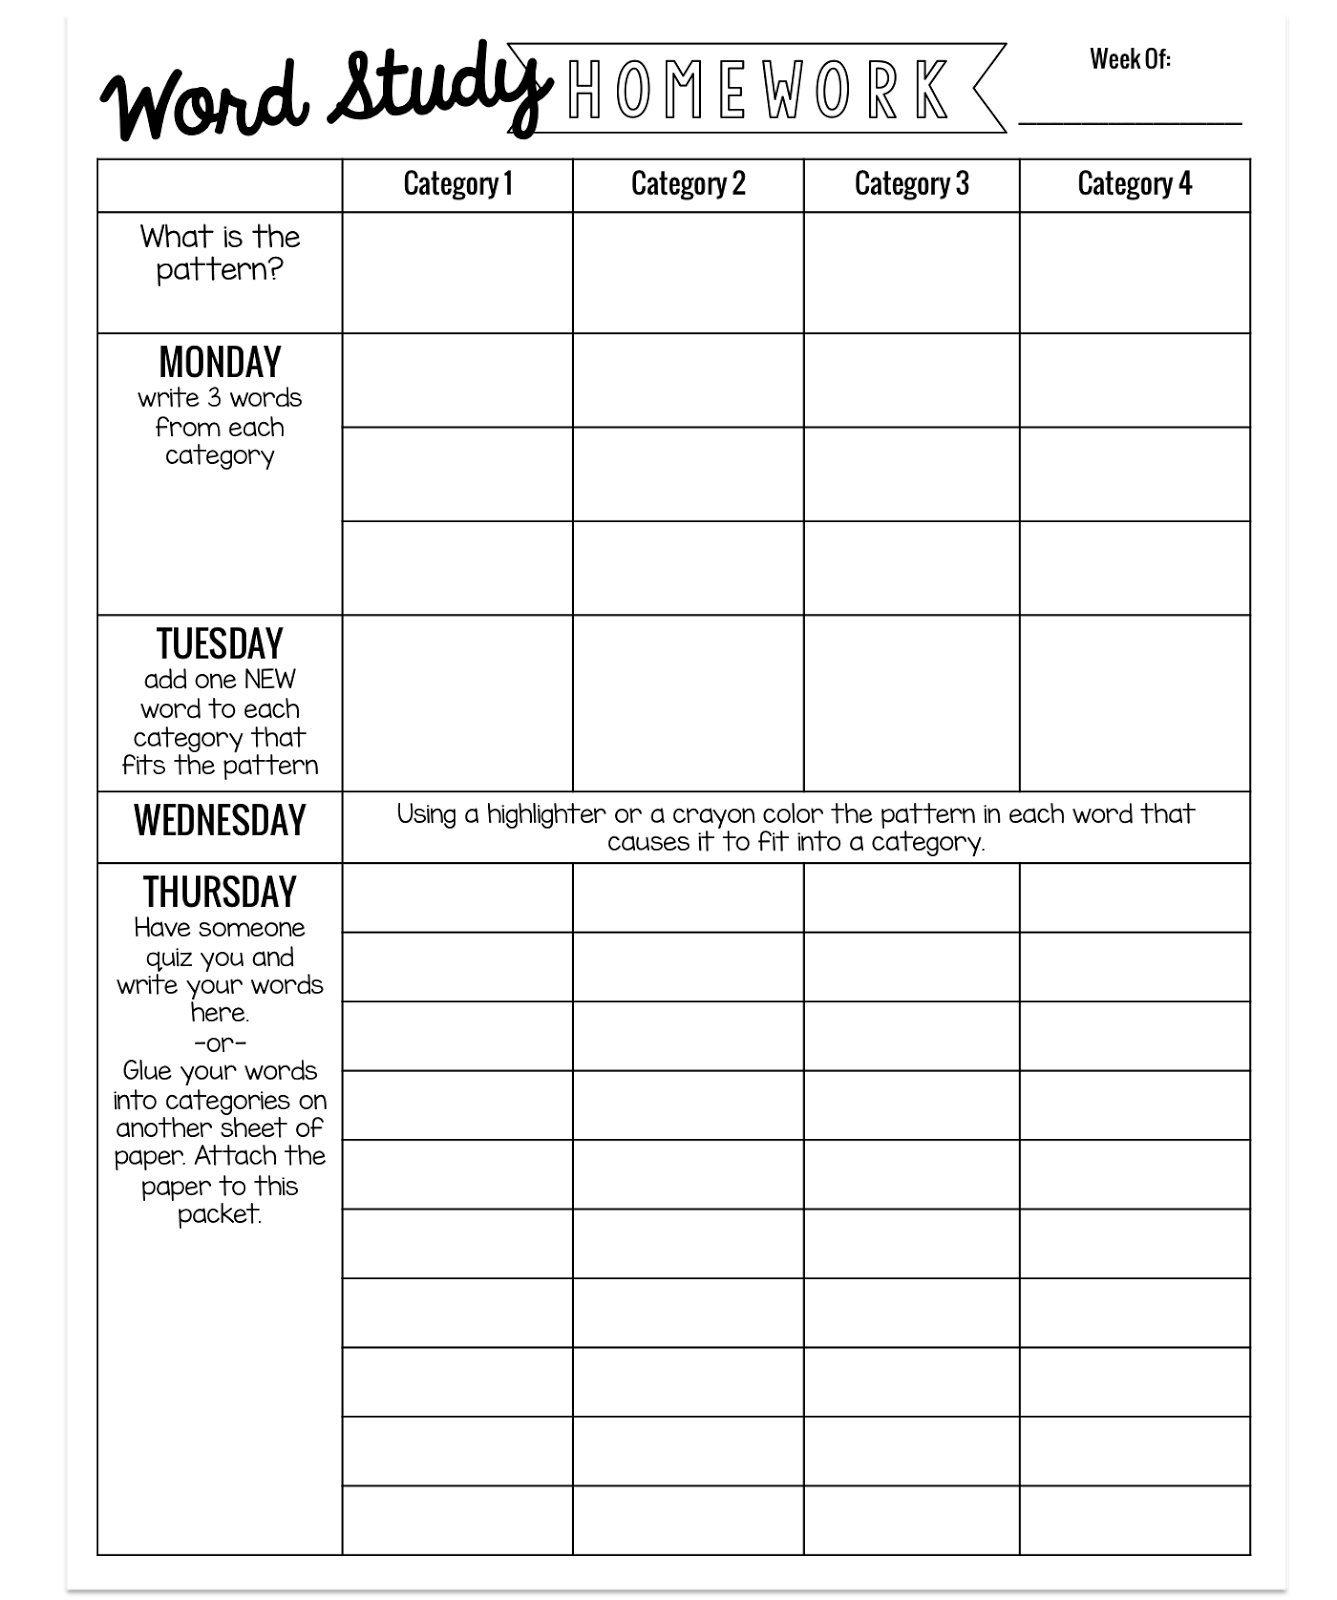 Simple Weekly Word Study Homework Teaching Language Arts, Teaching Writing,  Teaching Tips, Reading